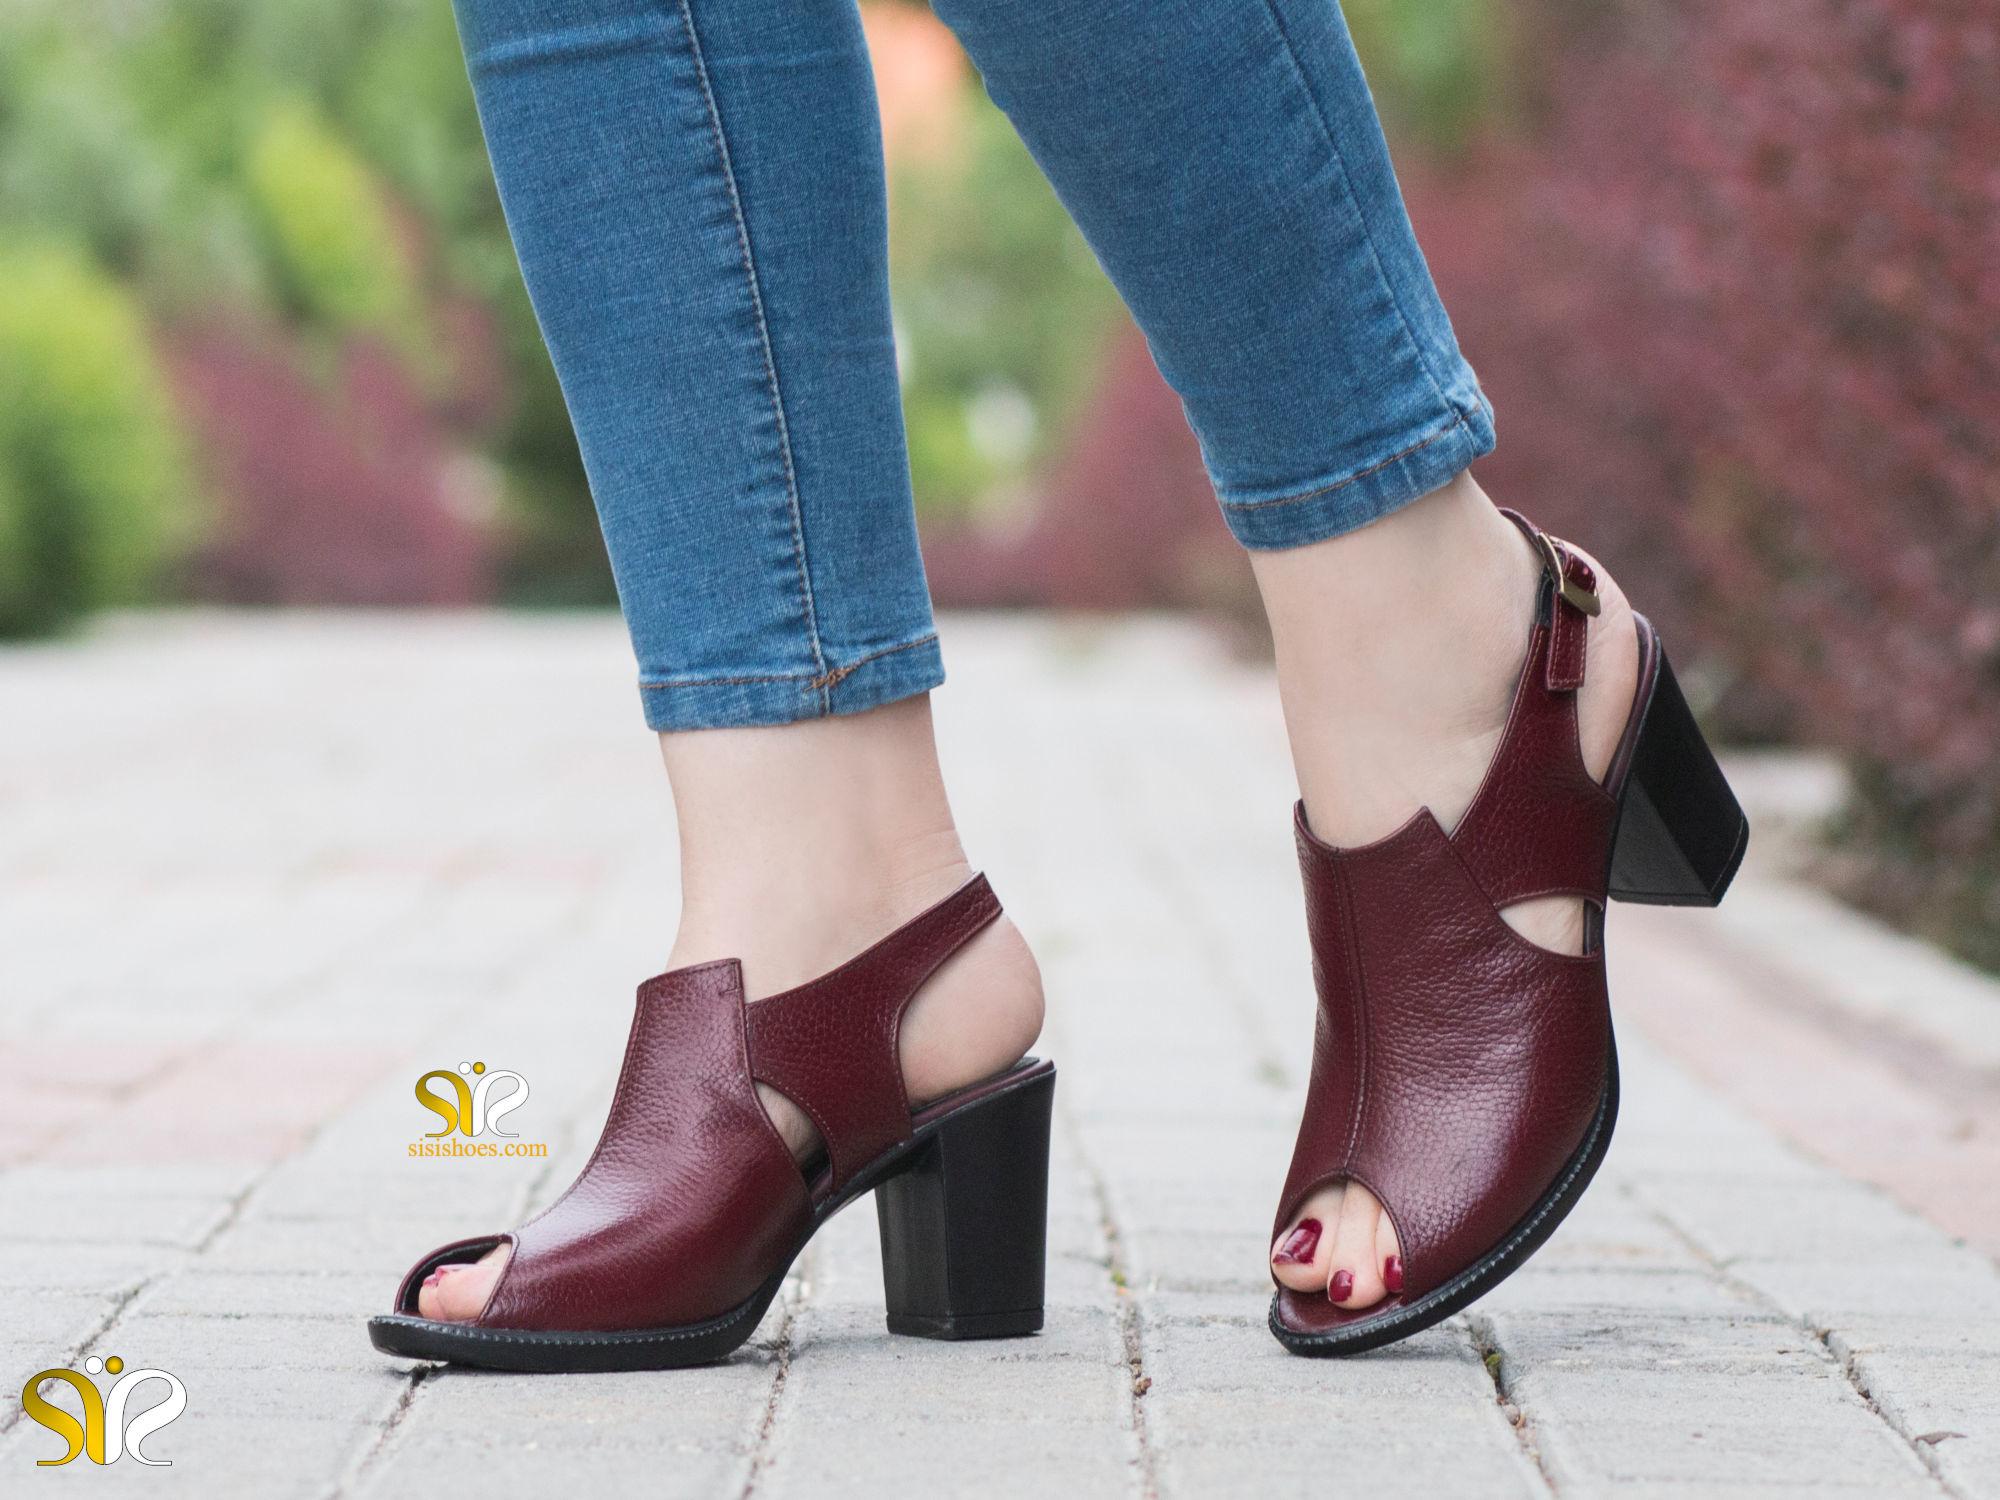 عکس مدل کفش زنانه لادینا رنگ زرشکی